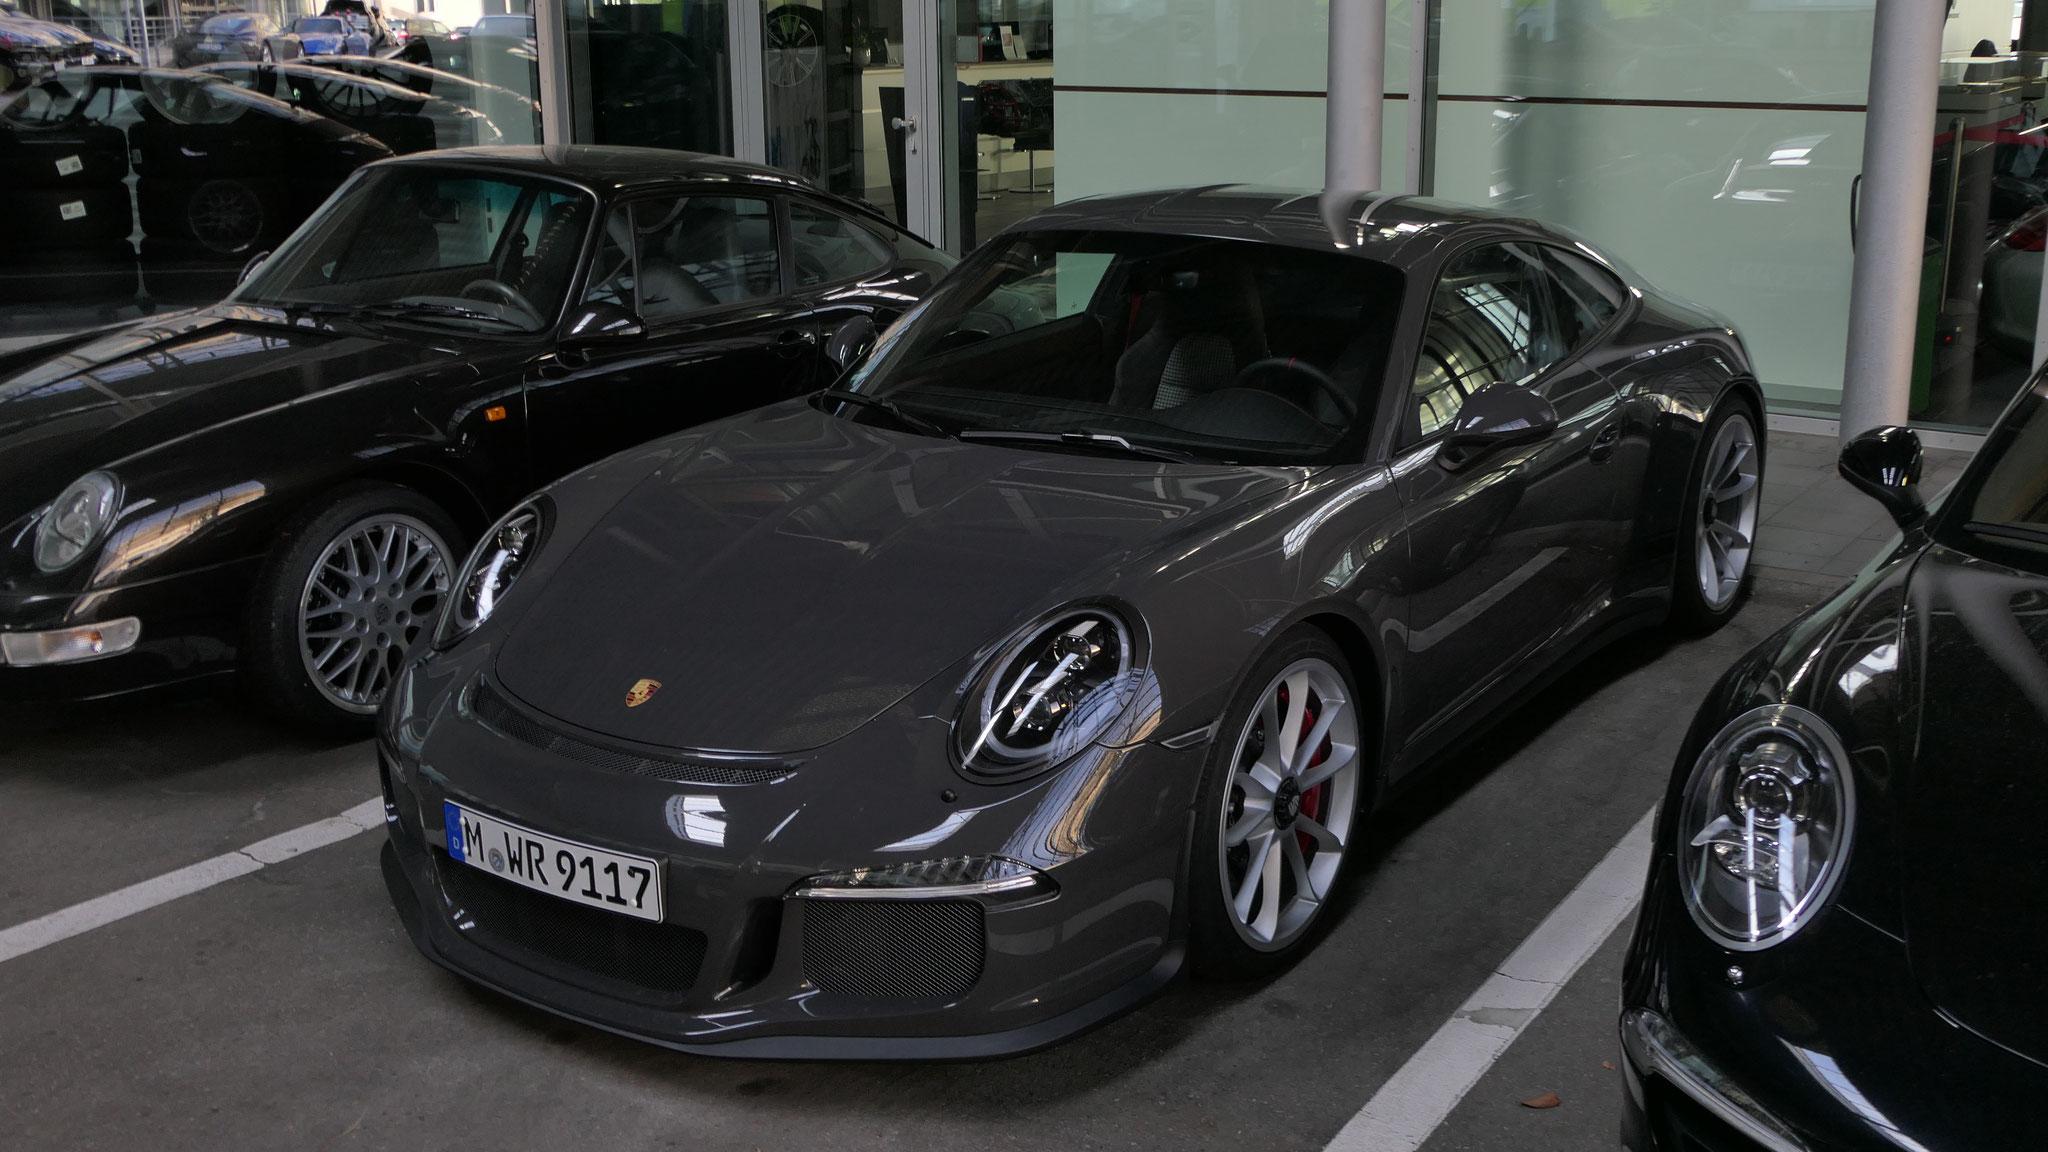 Porsche 991 GT3 Touring Package - M-WR-9117